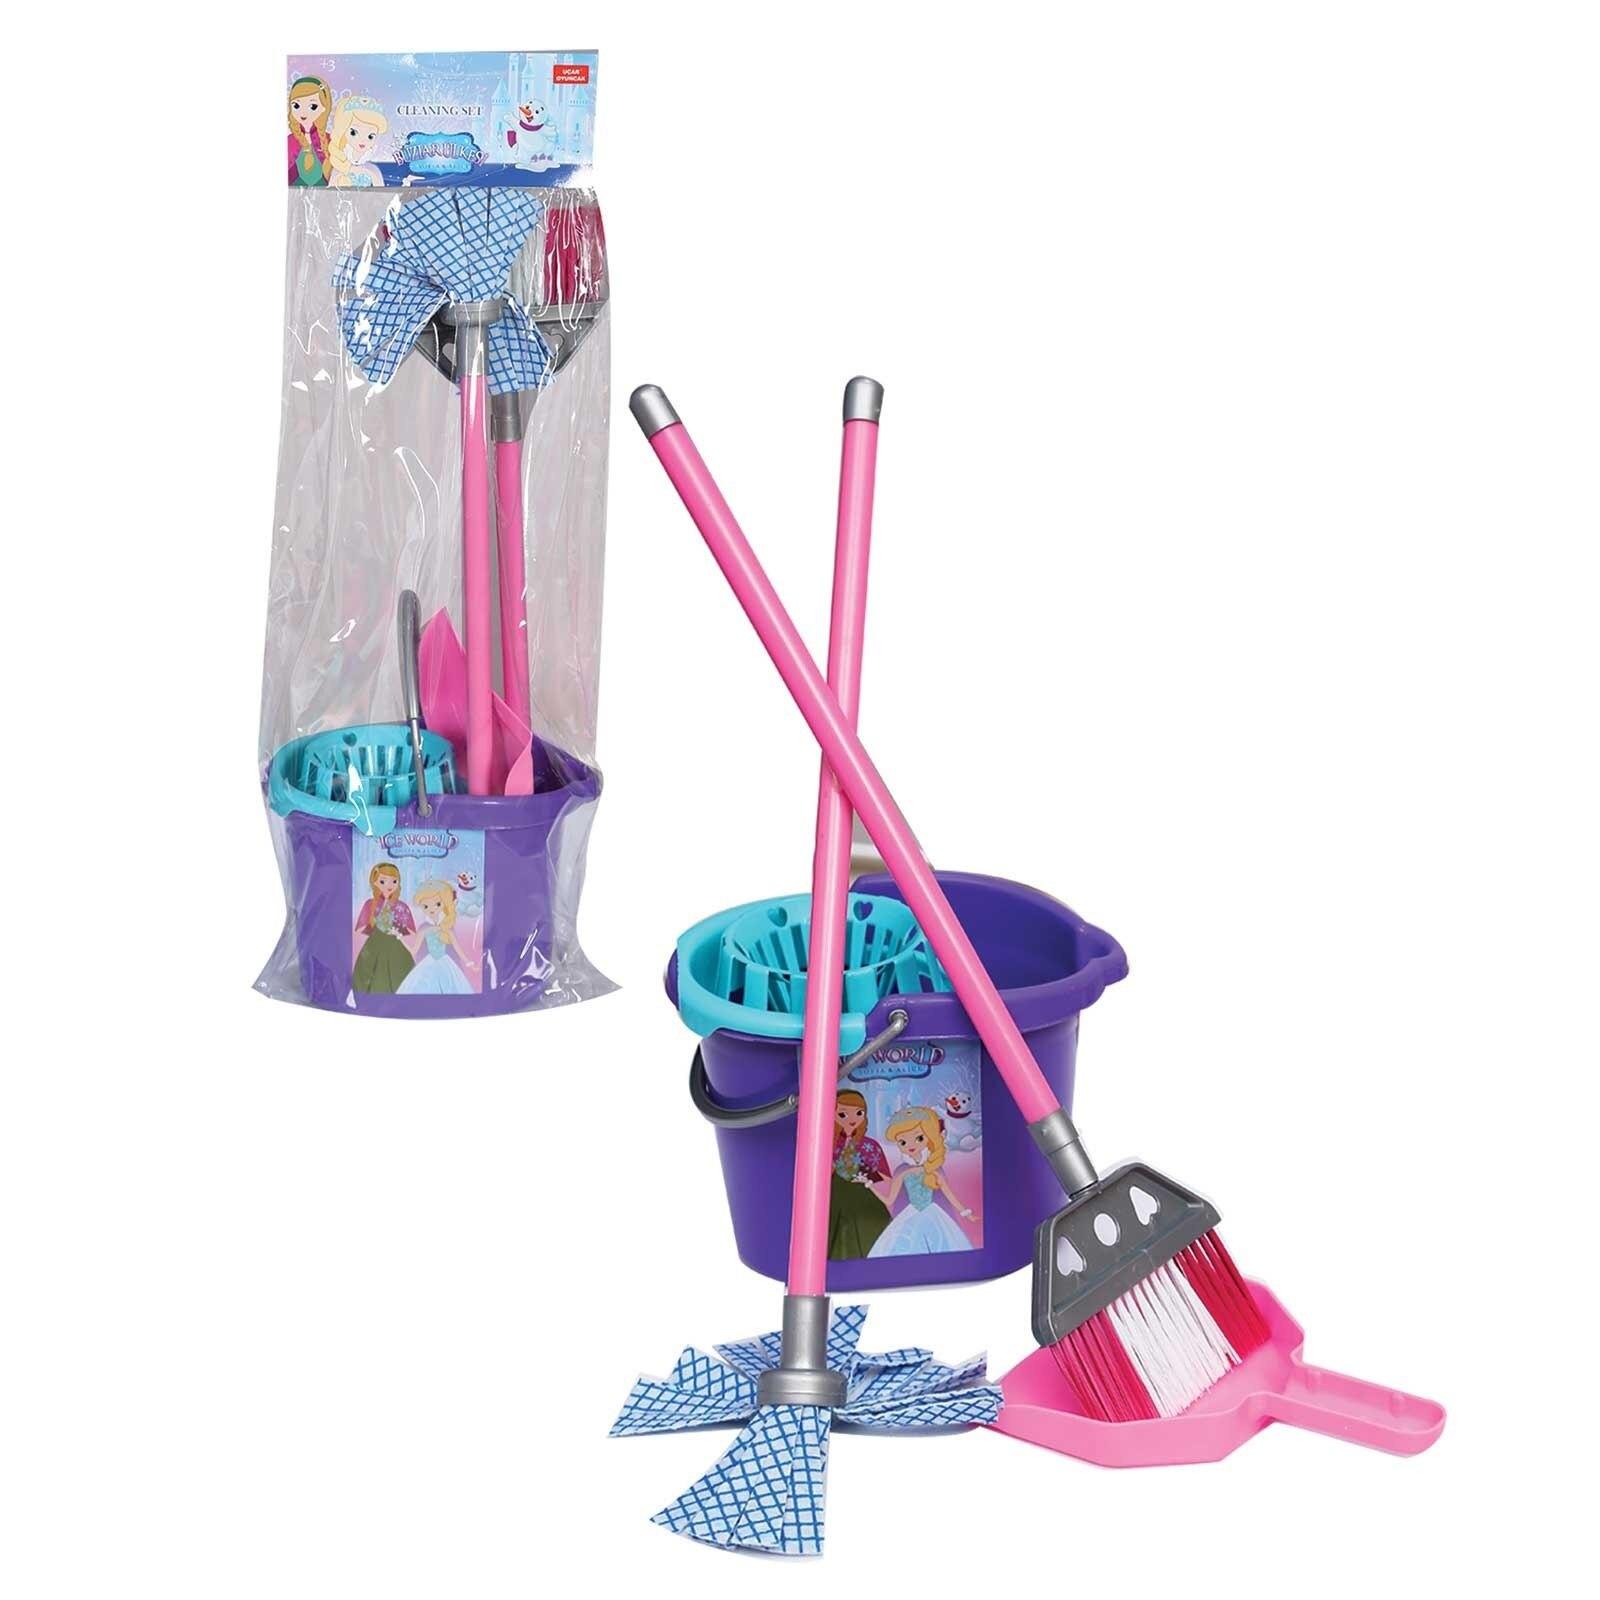 Ebebek Uçar Oyuncak Ice Country Cleaning Set